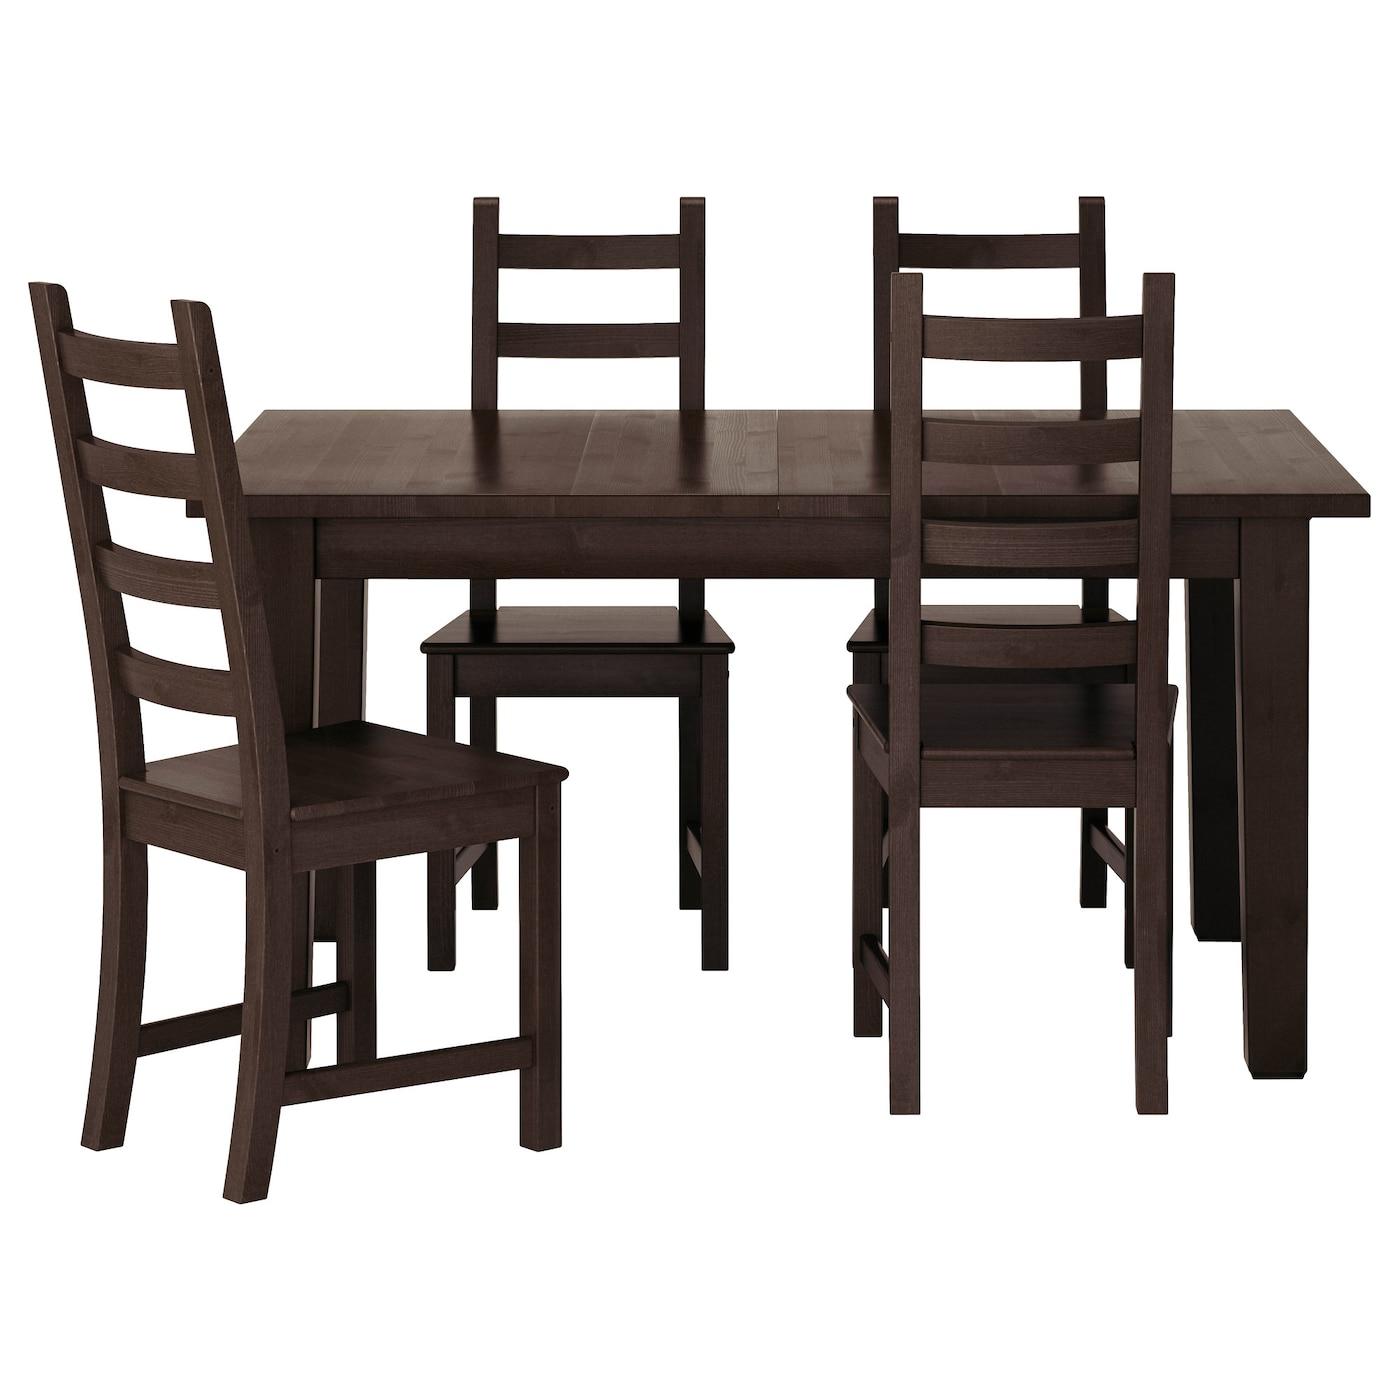 Ensembles tables et chaises max 4 pers ikea - Esszimmermobel ikea ...